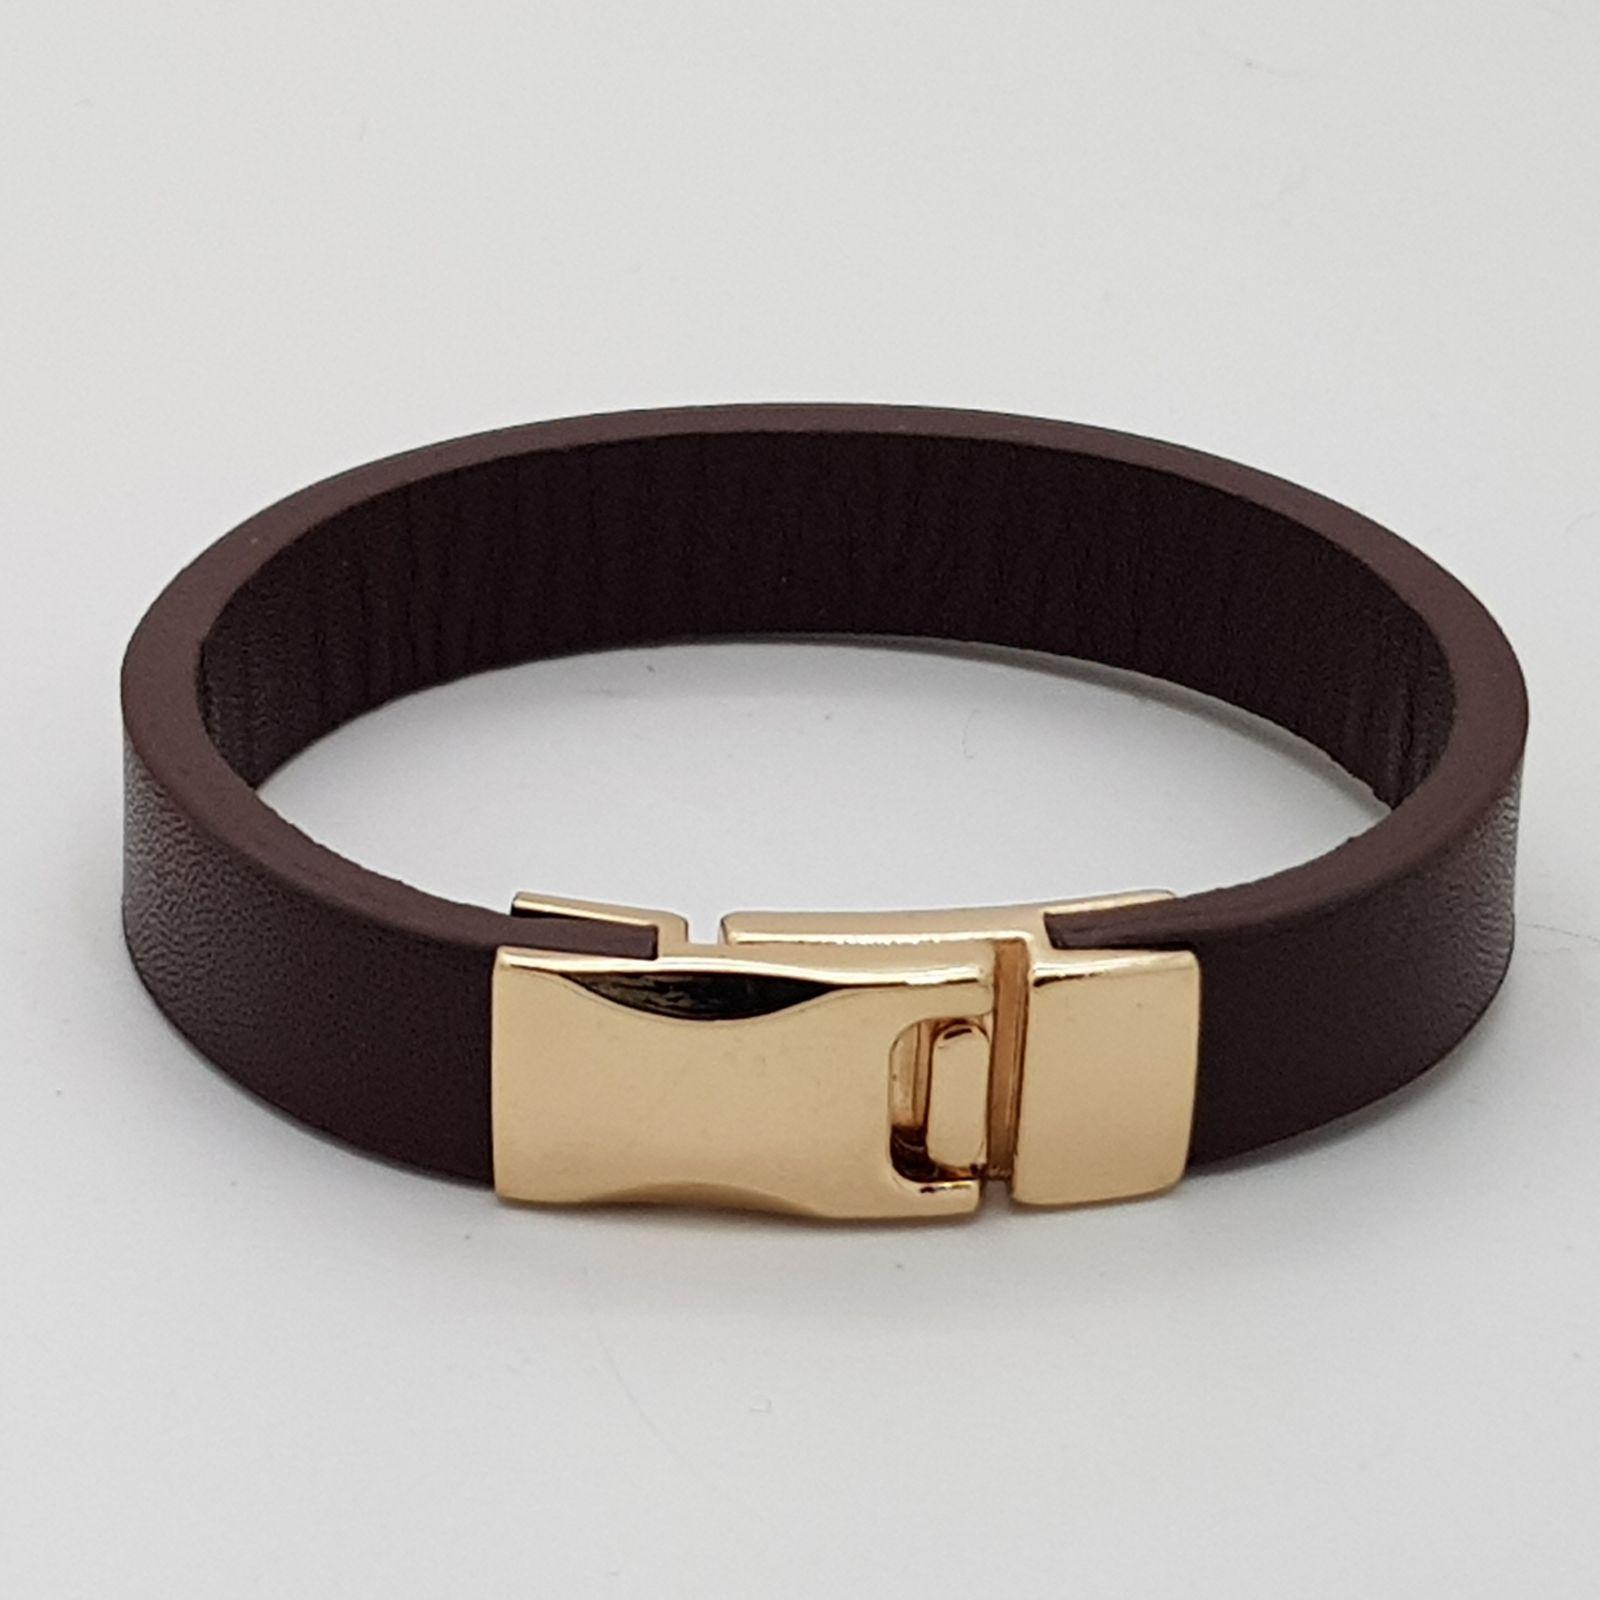 دستبند کد ۱۲۰ thumb 2 6